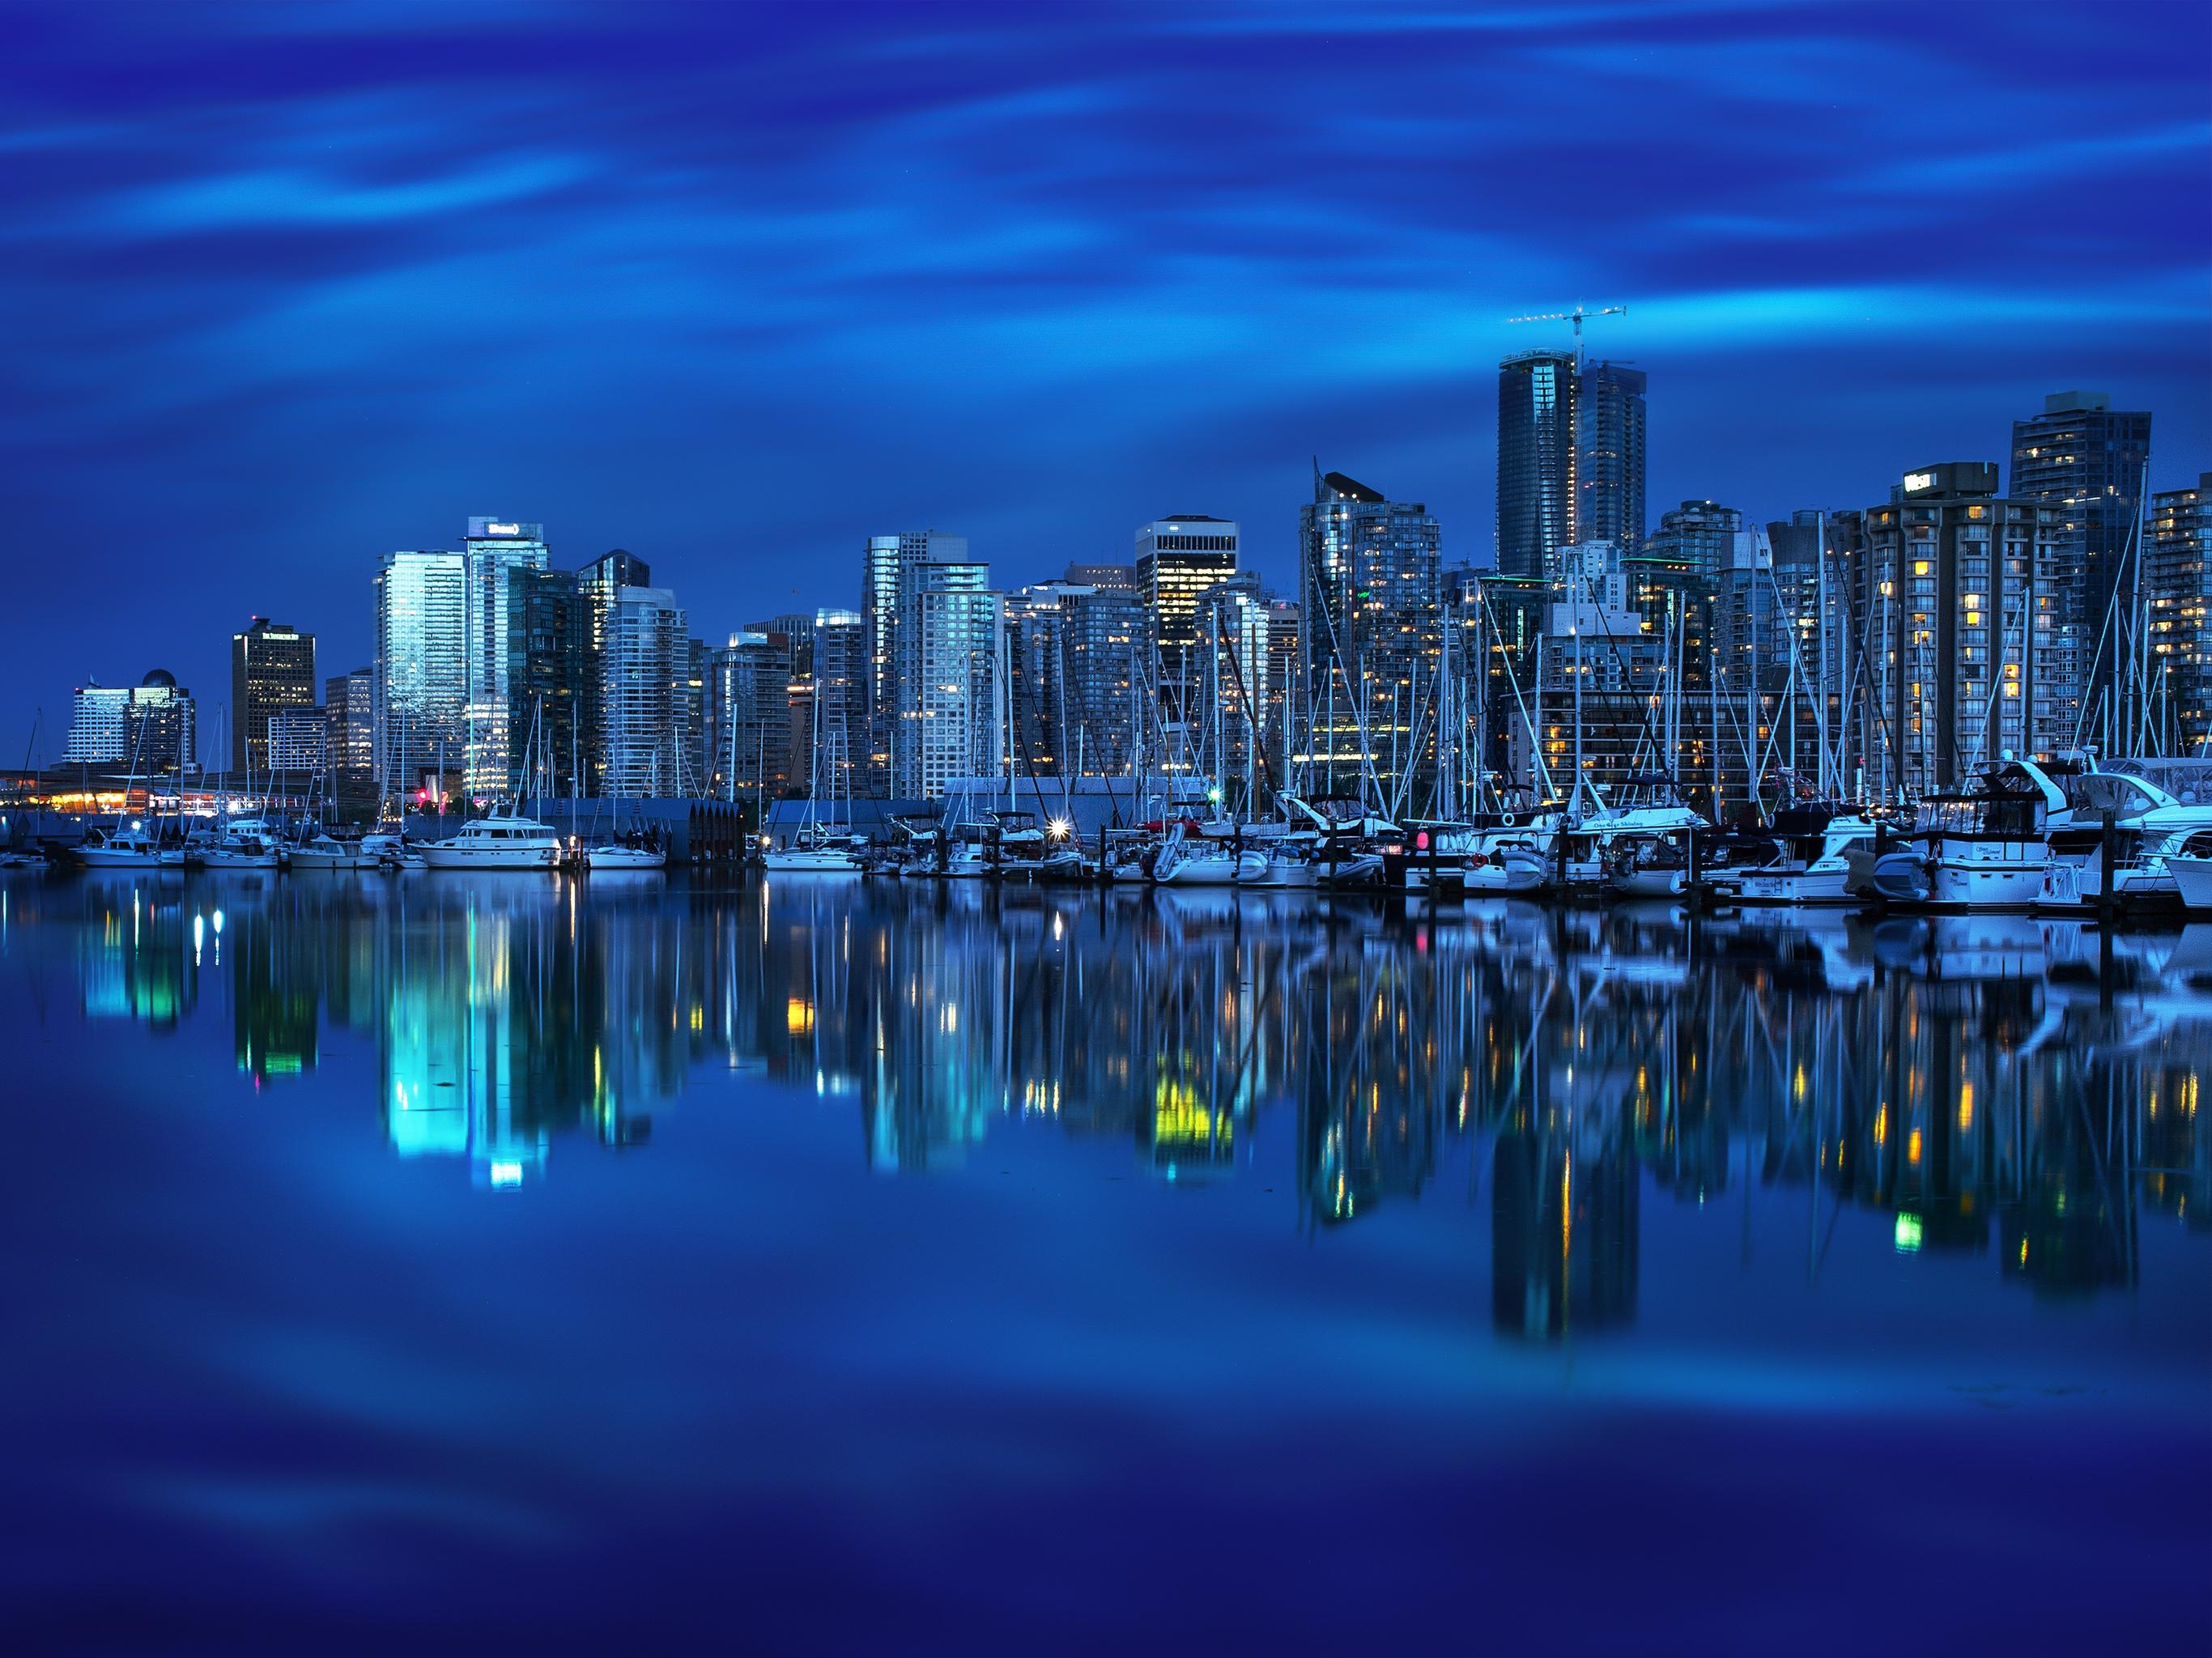 Download Vancouvers Mirror by Mohsen Kamalzadeh 2732x2048